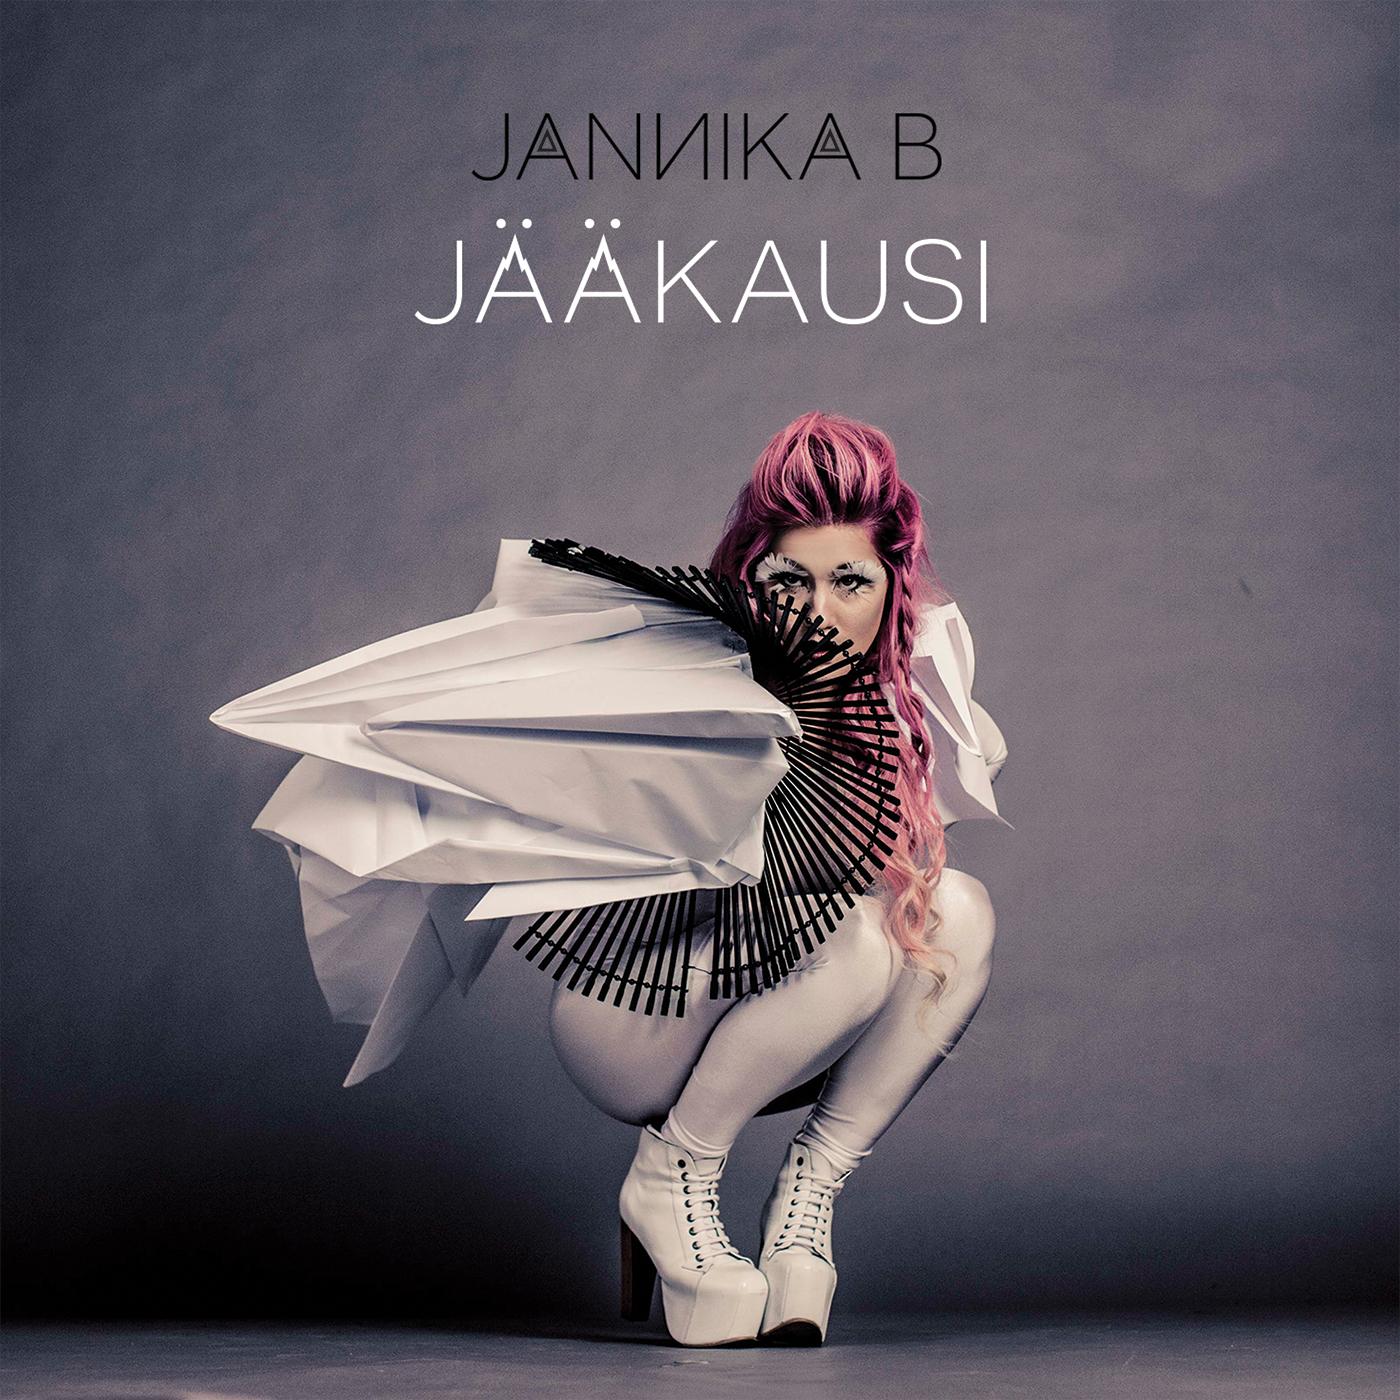 Jannika_b-j%C3%A4%C3%A4kausi.png